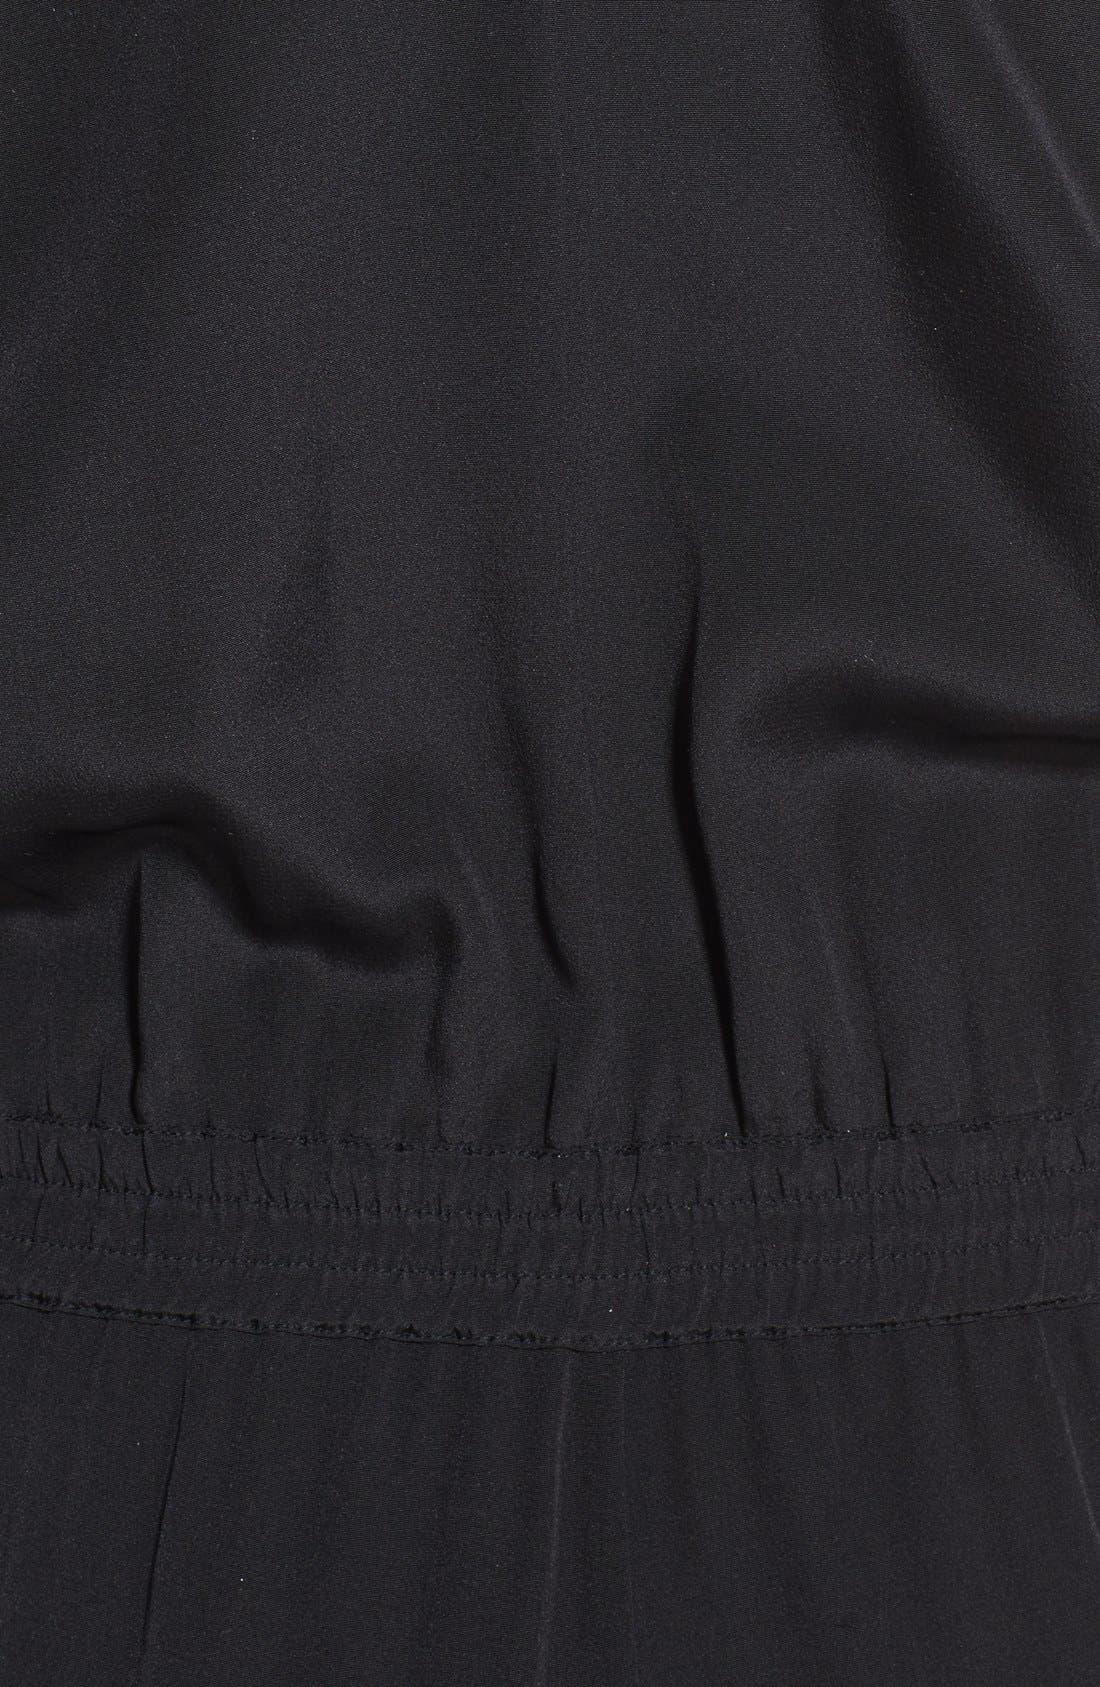 Sleeveless Silk Jumpsuit,                             Alternate thumbnail 4, color,                             011